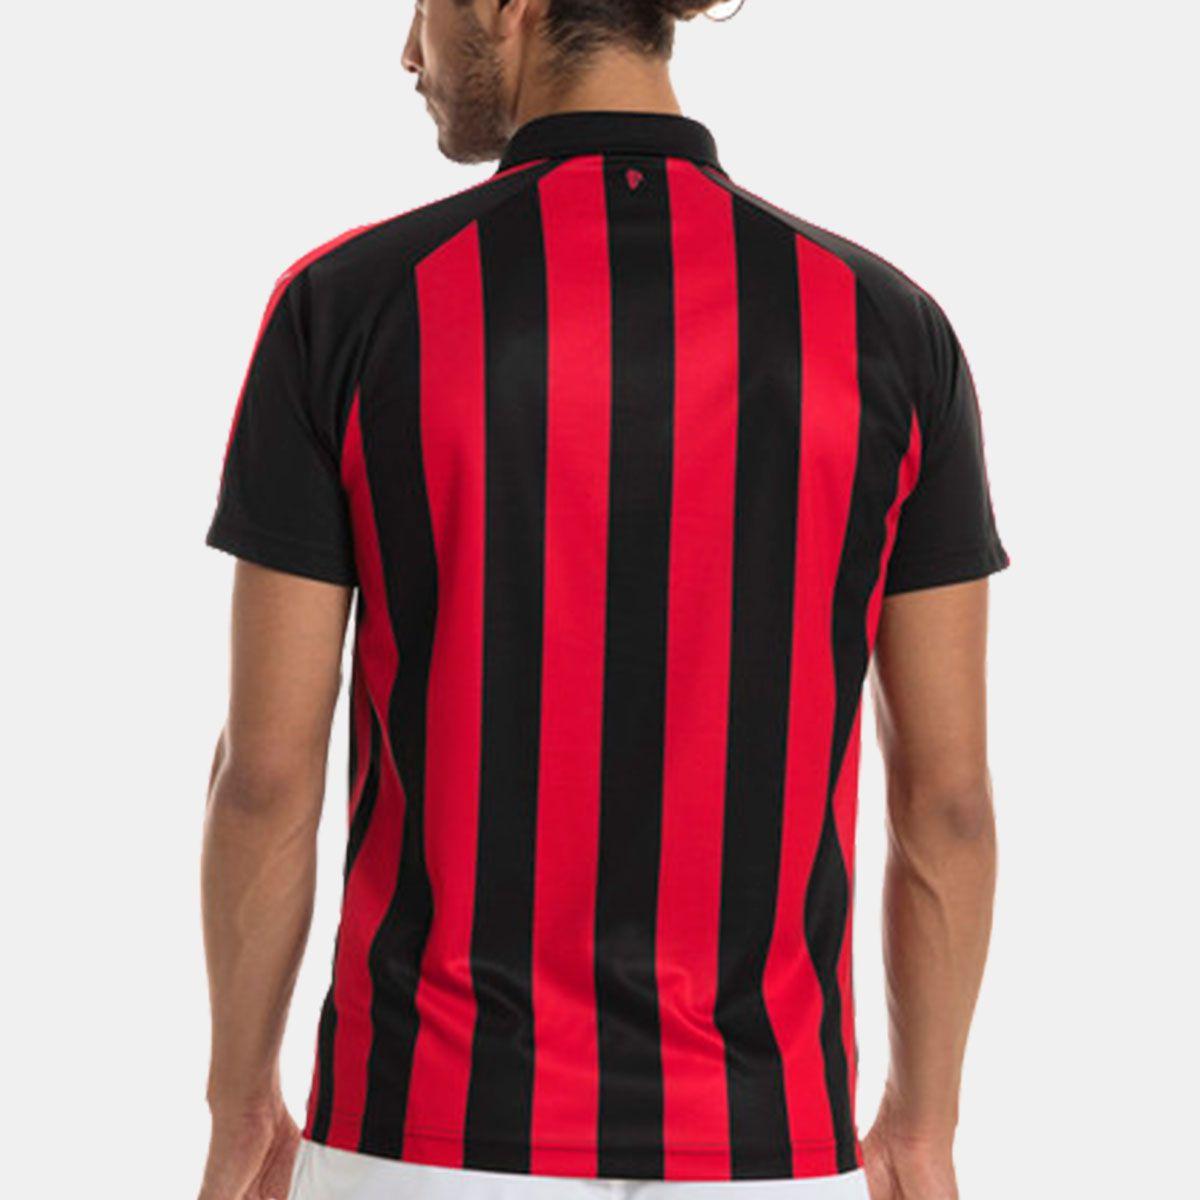 Camisa Milan Home Puma 2018